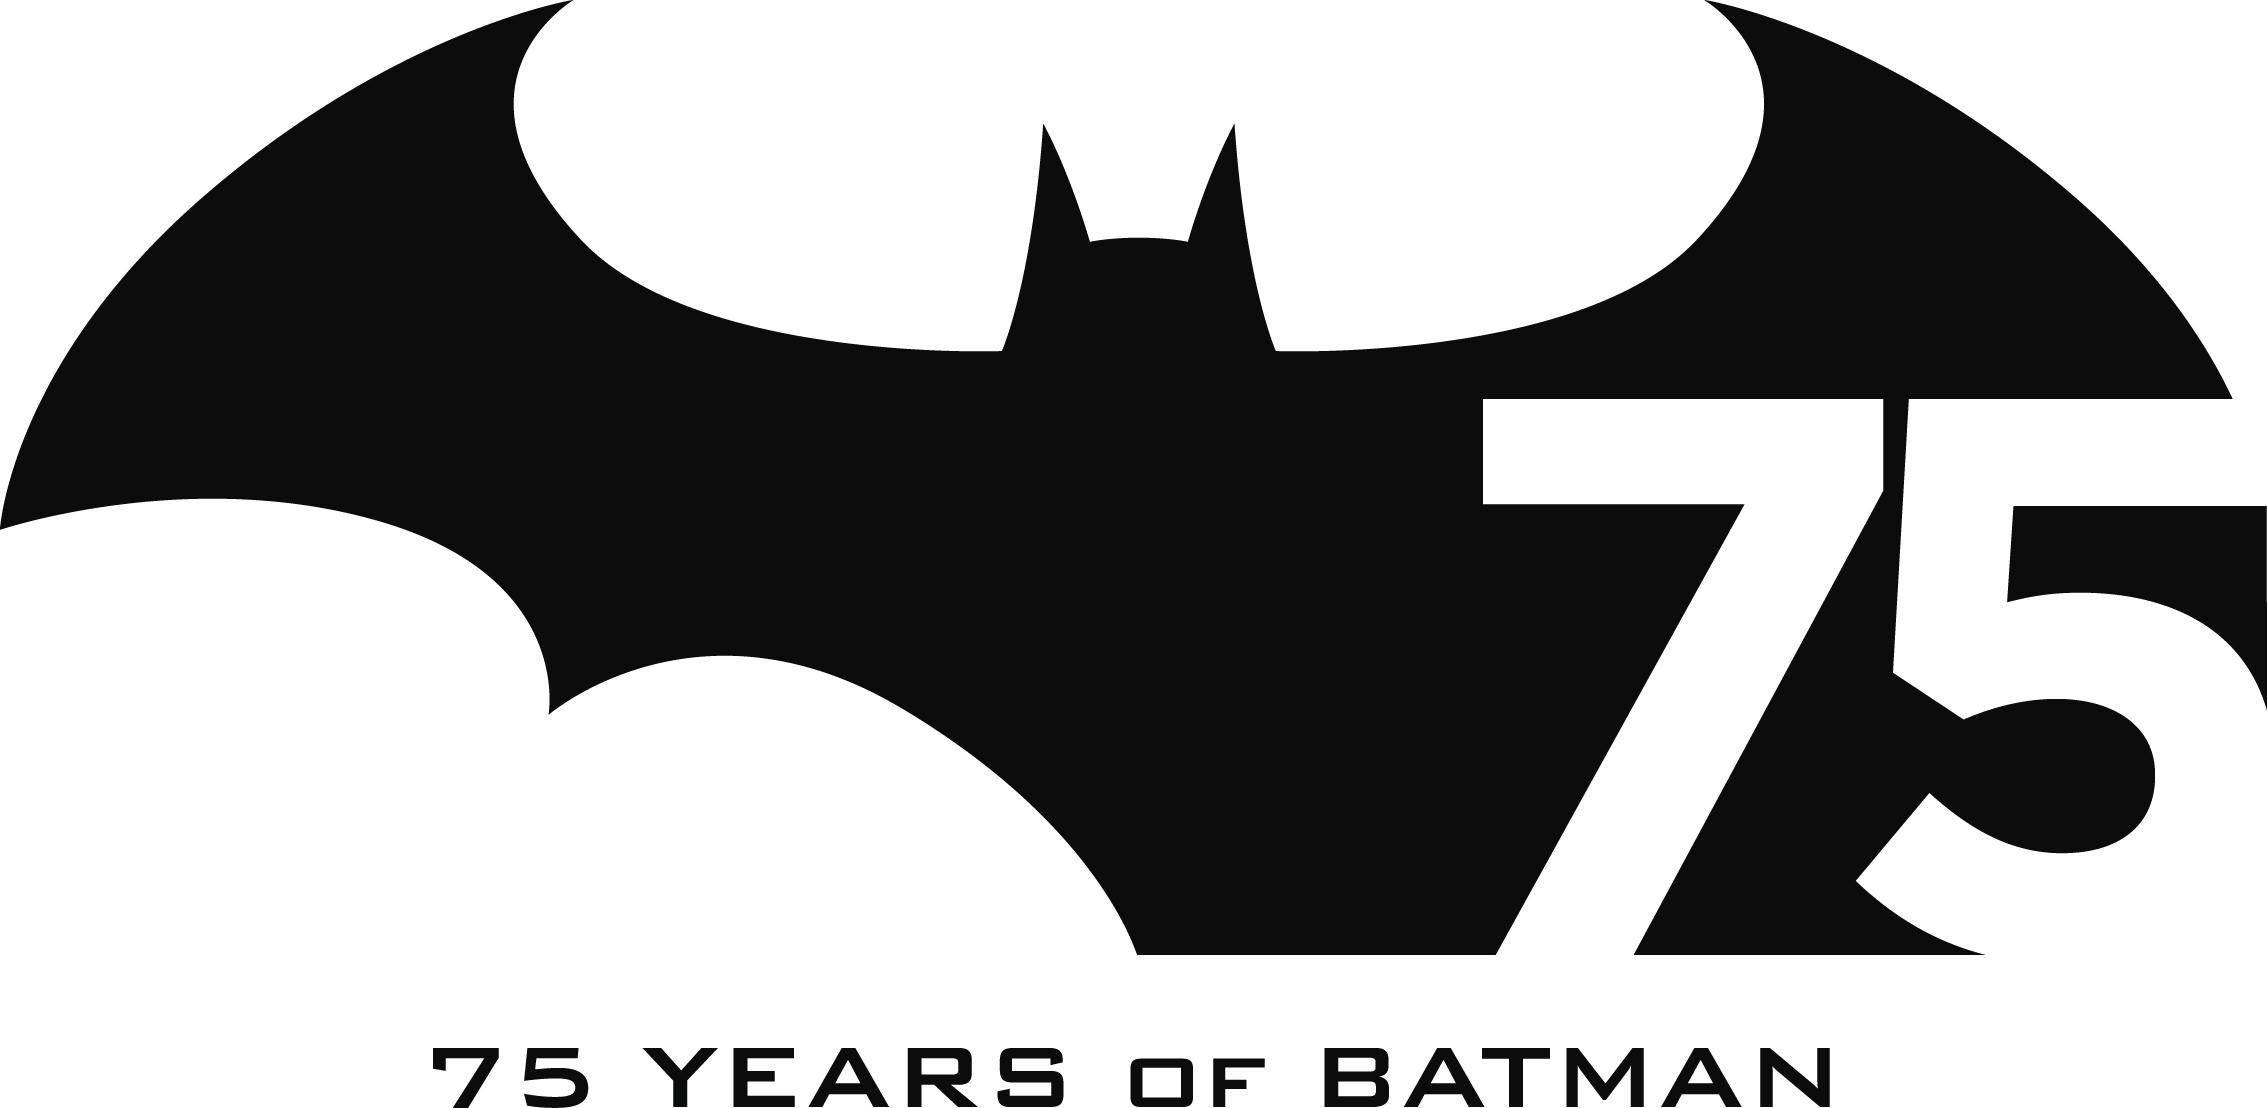 2267x1108 75 Years Of Batman